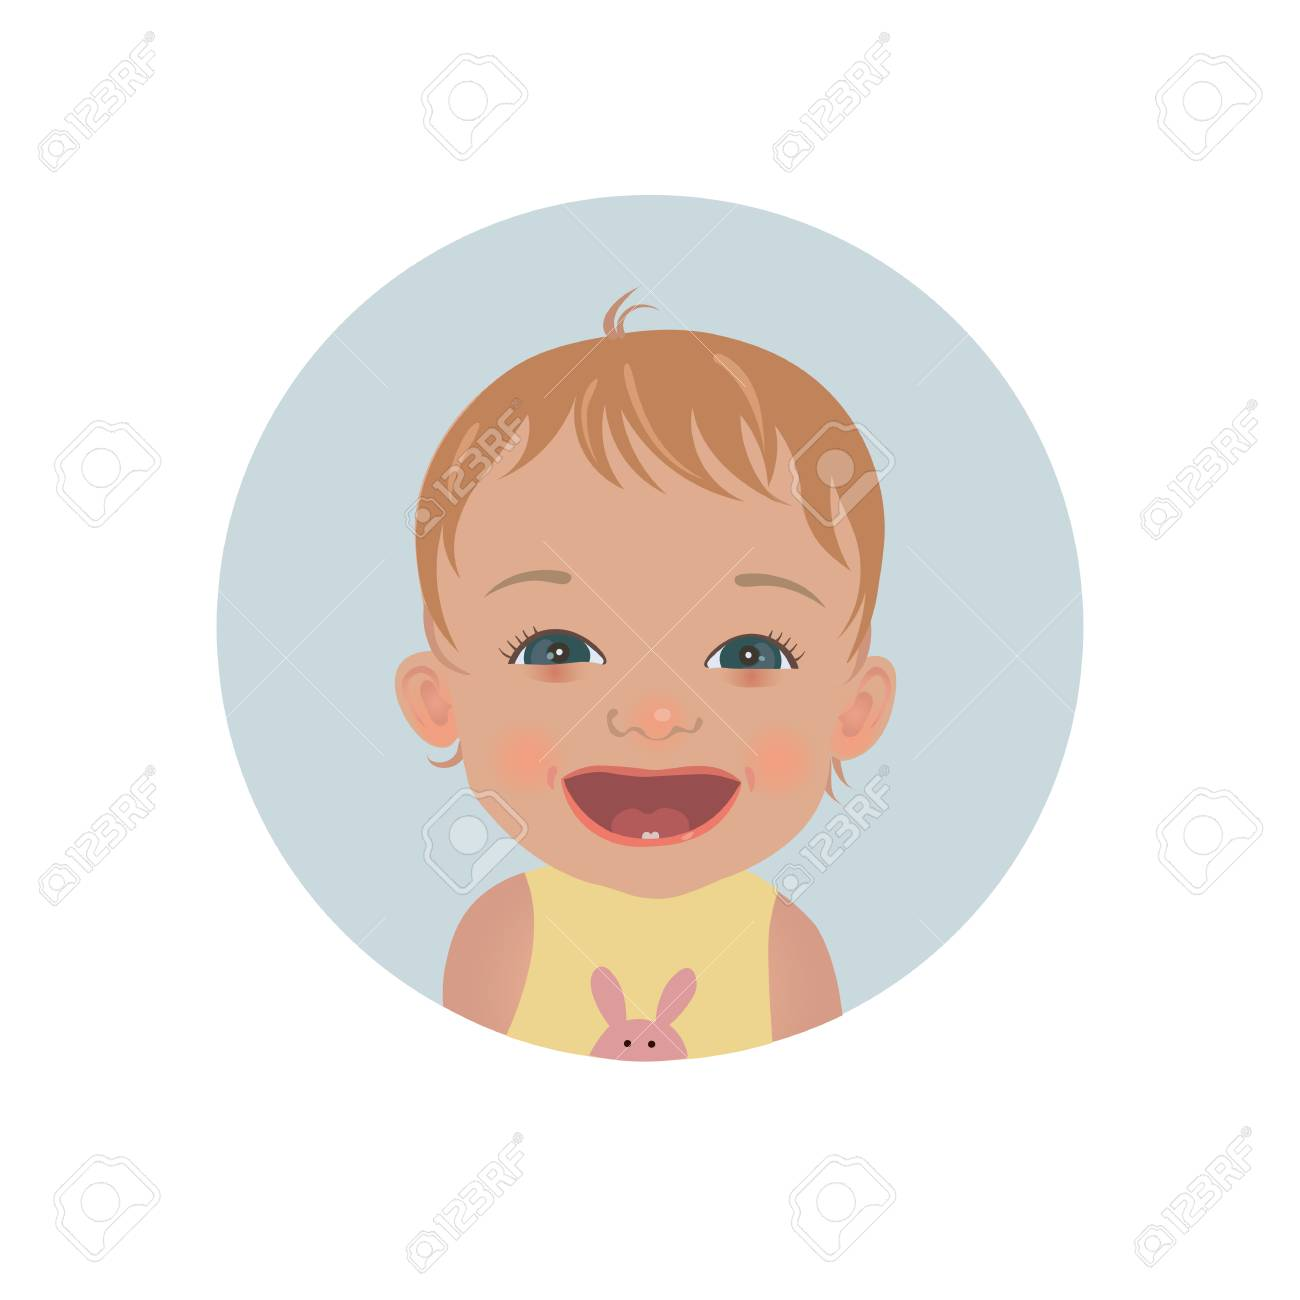 happy baby emoticon smiling child emoji cute cheerful toddler